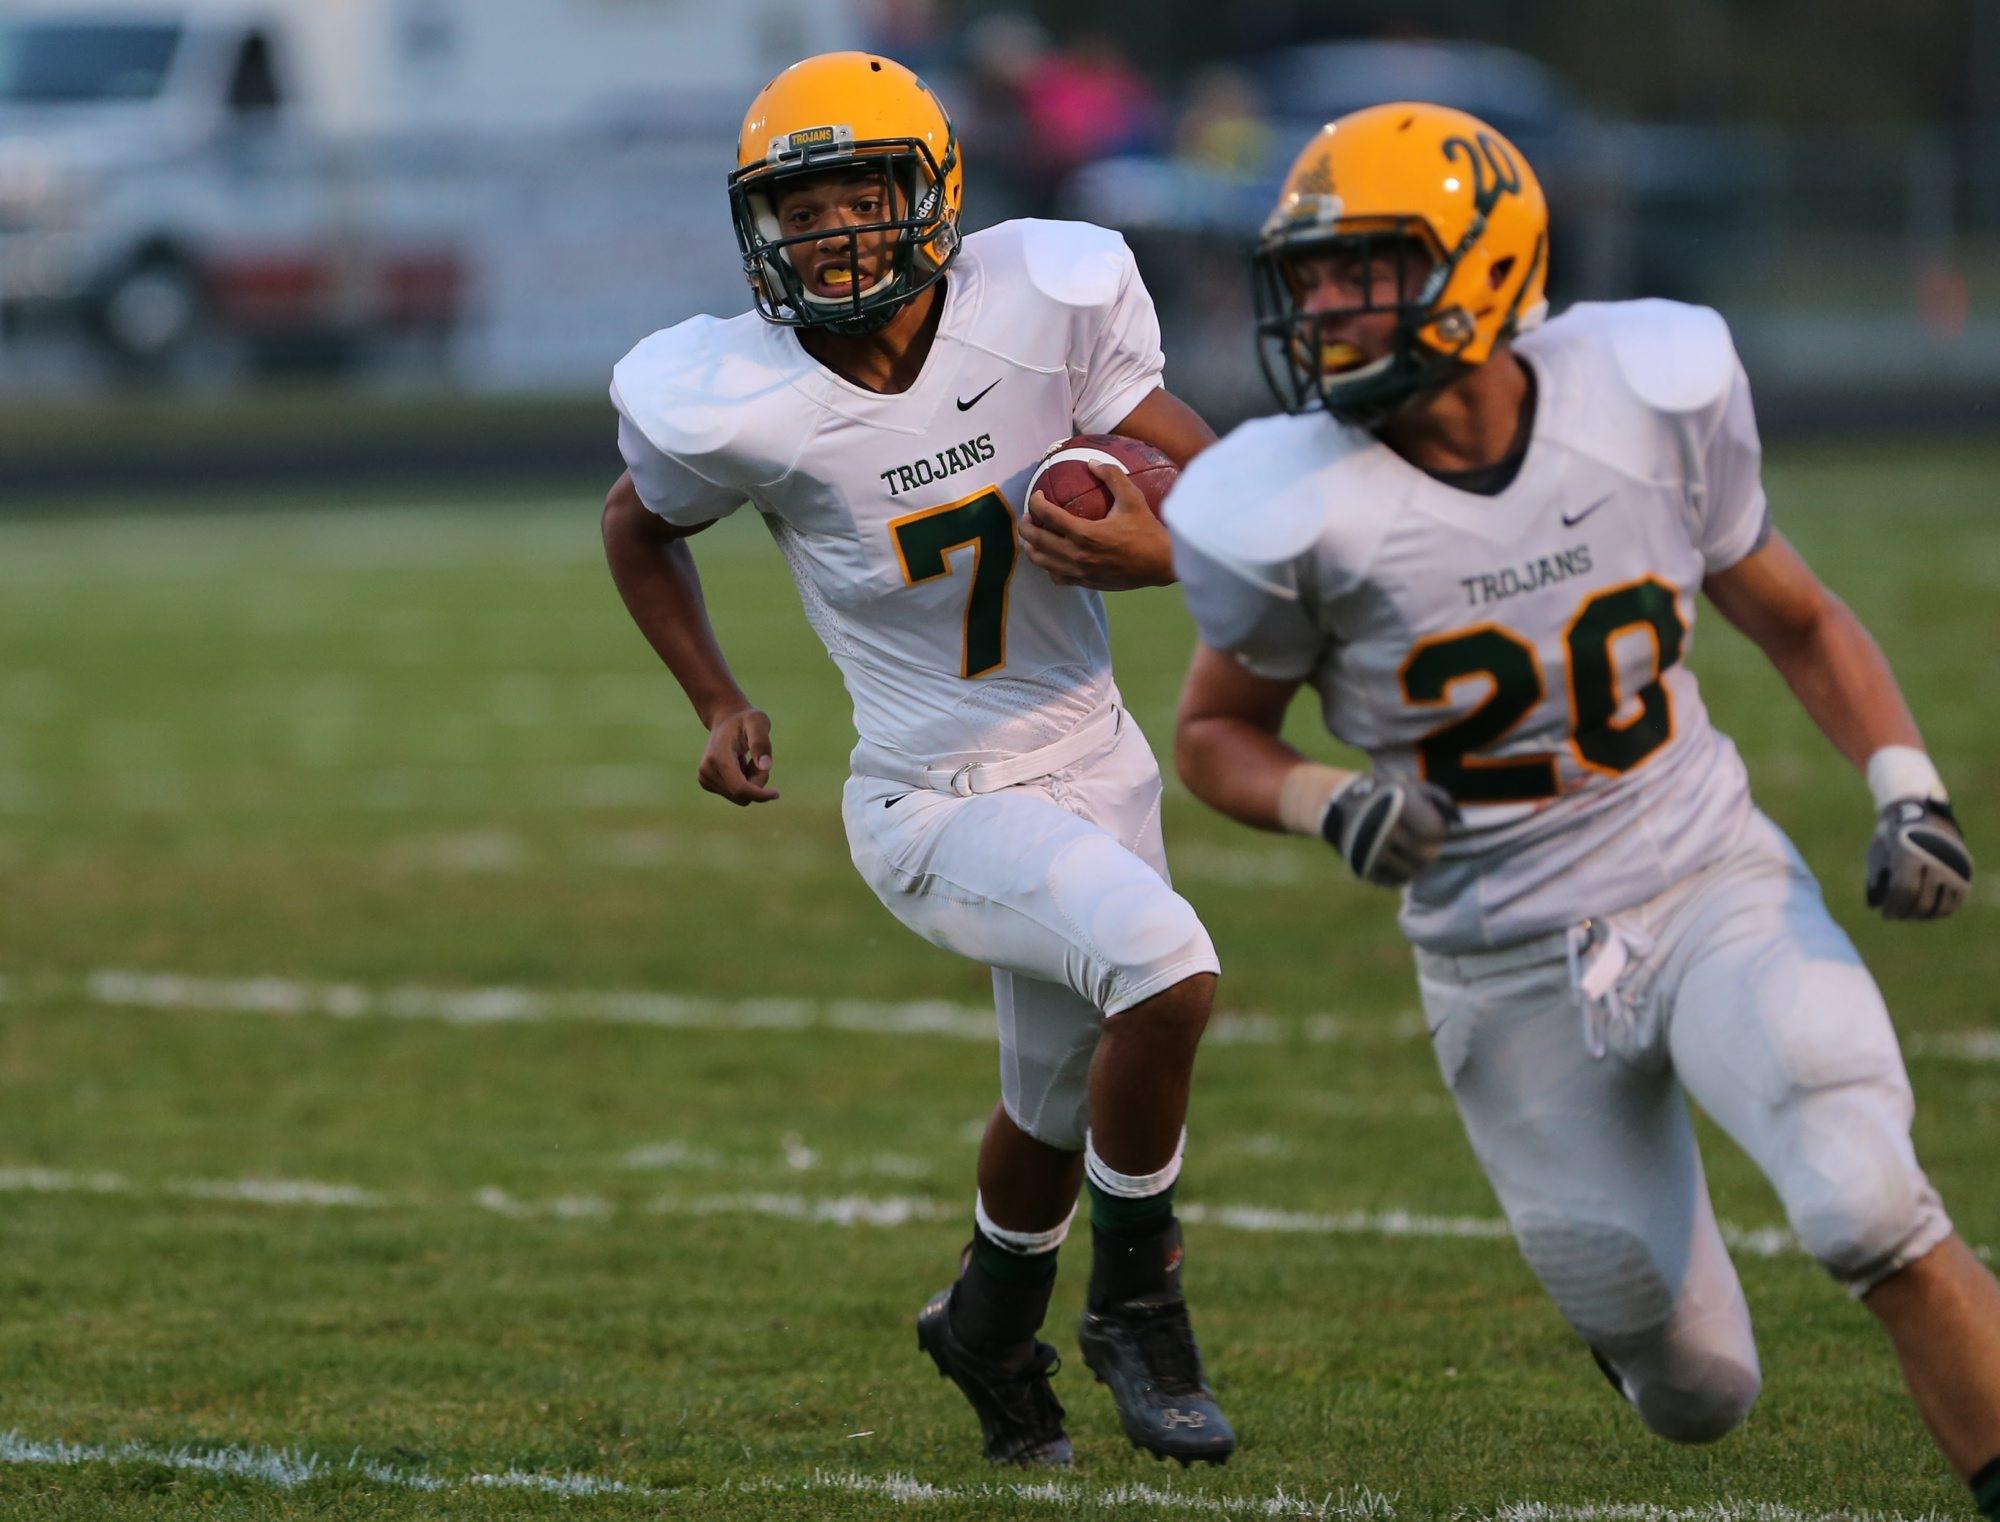 West Seneca East's Jolexis Santiago, left, runs for one of his two touchdowns against Iroquois.